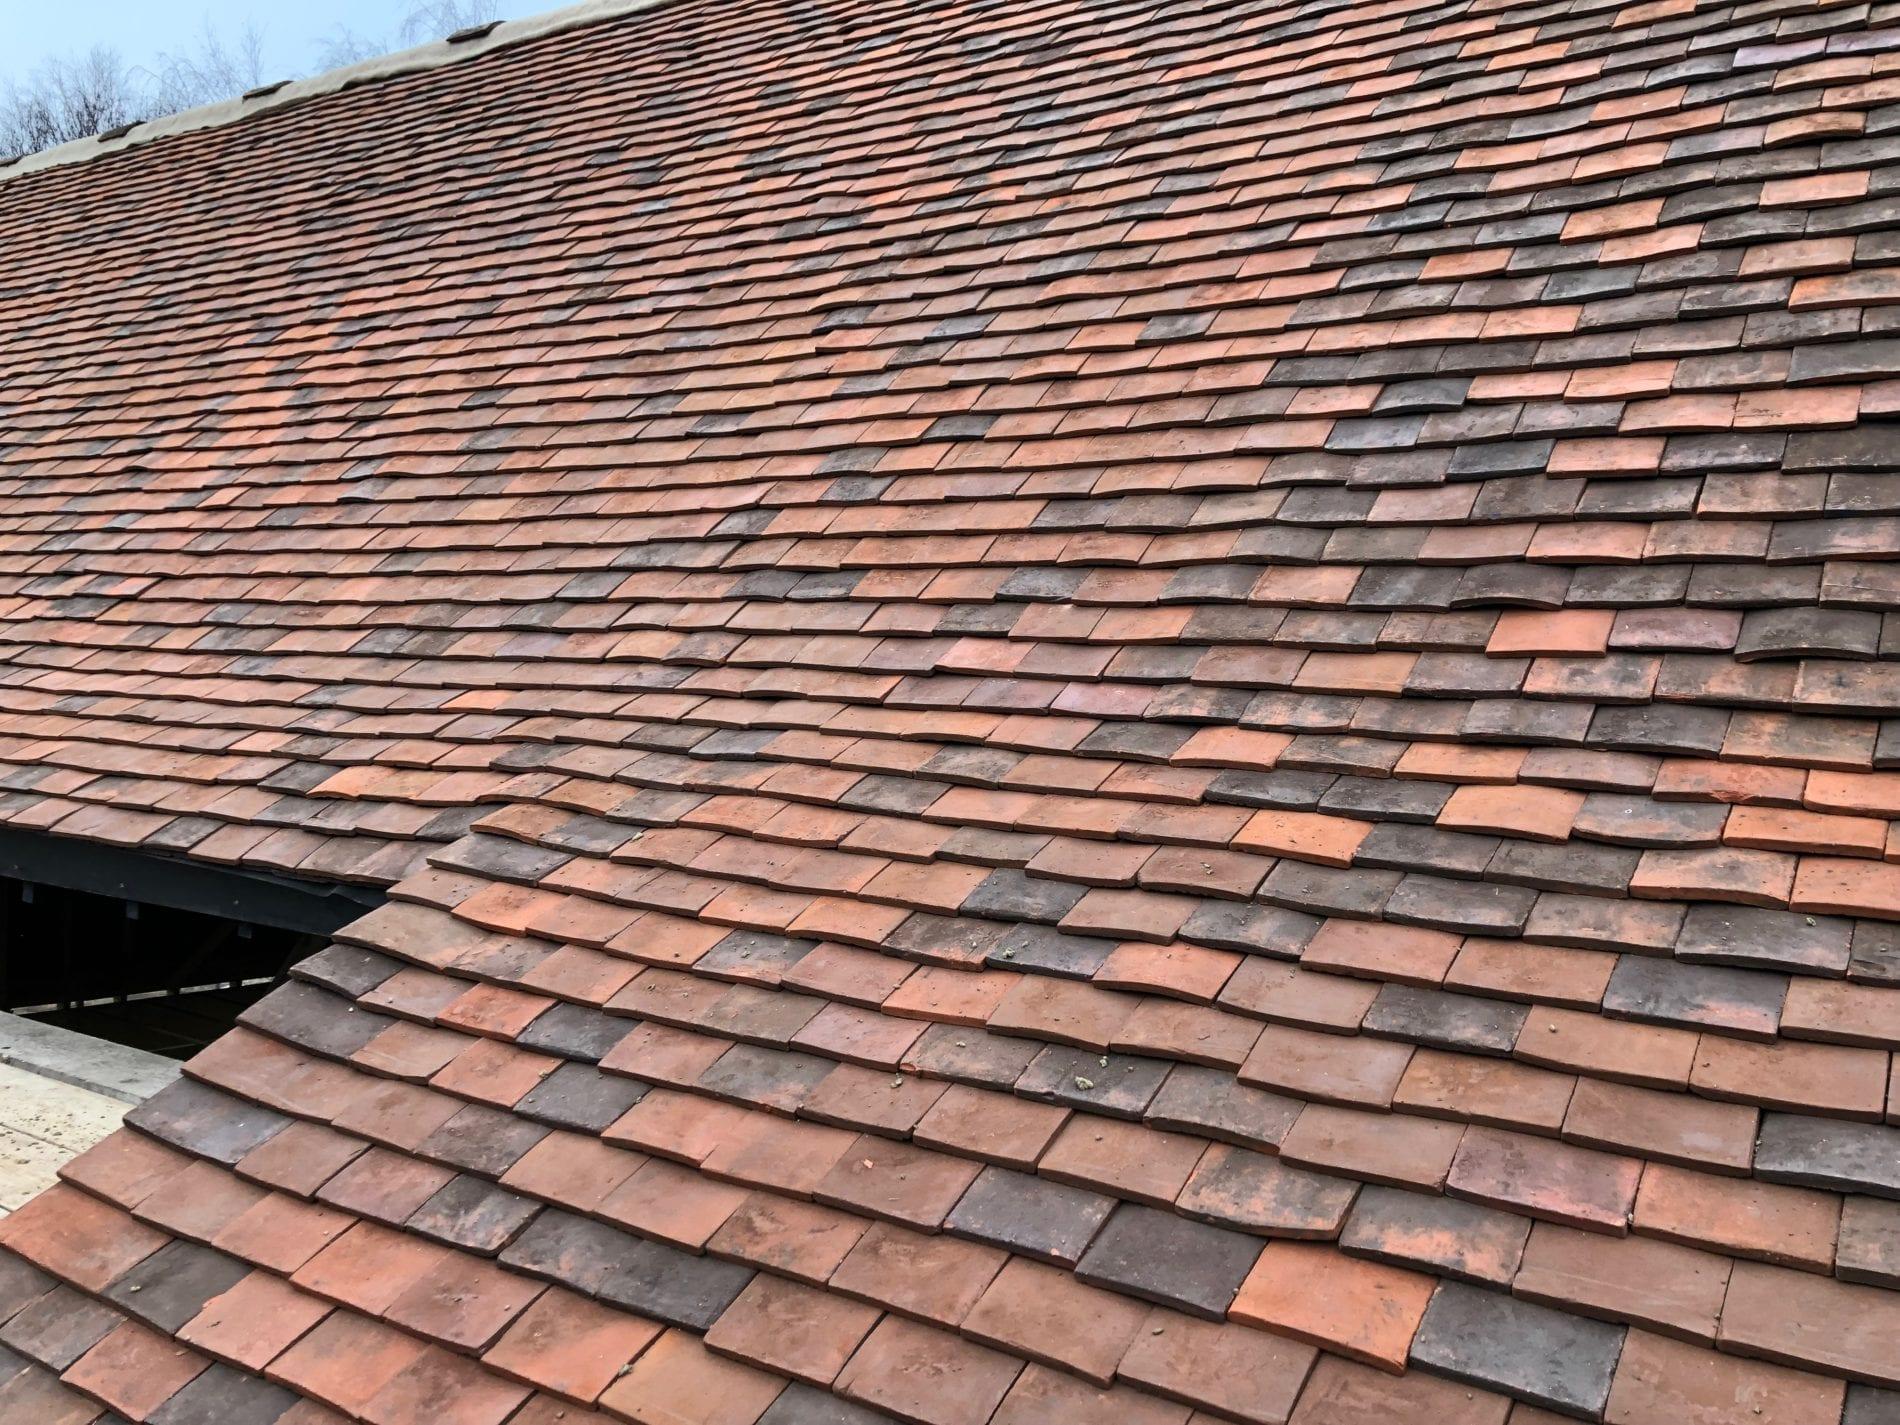 Lavenham handmade tiles roofscape